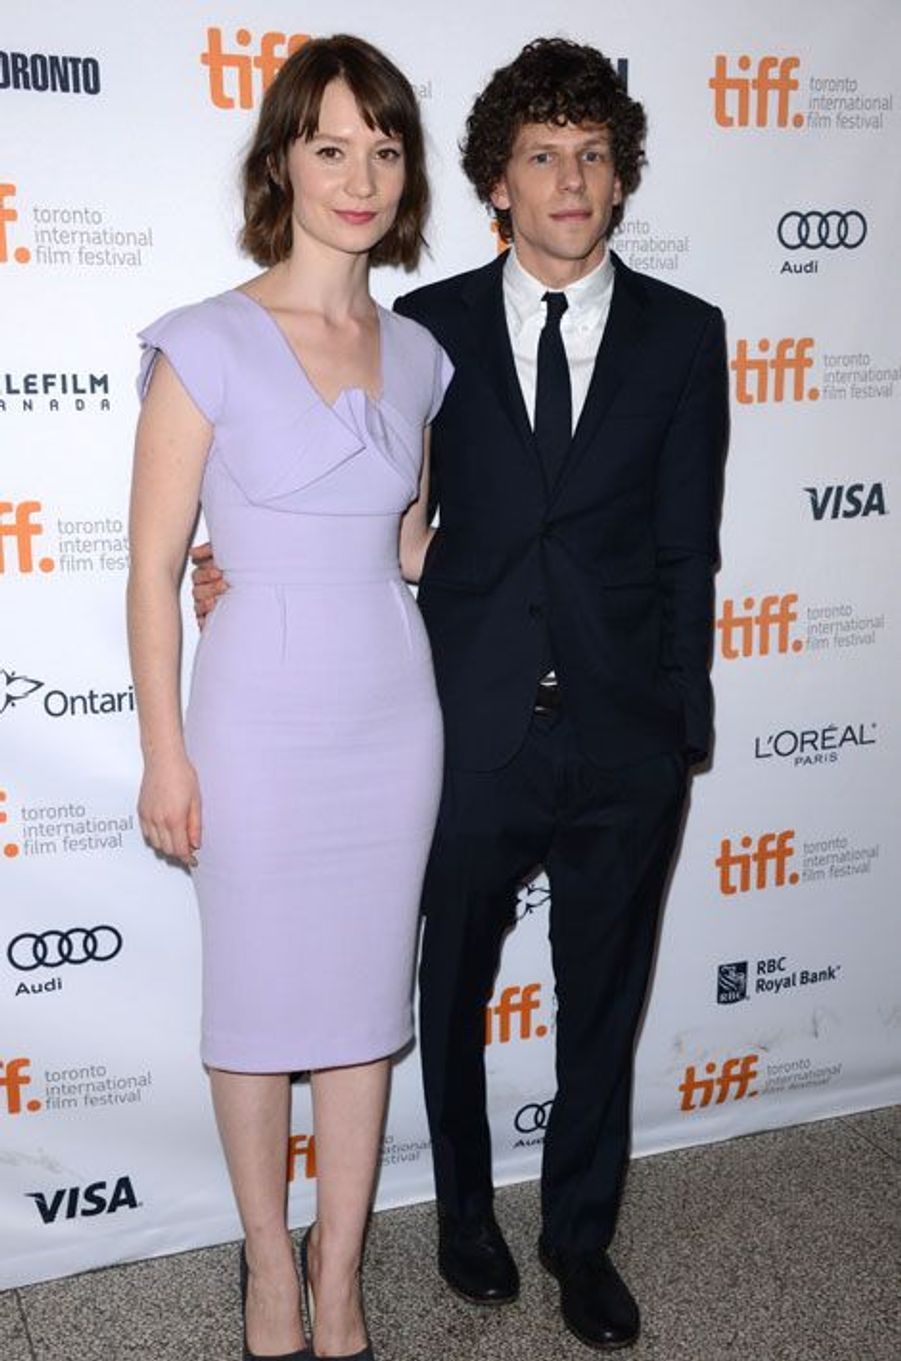 Jesse Eisenberg(The Social Network) et Mia Wasikowska (Alice au pays des merveilles)